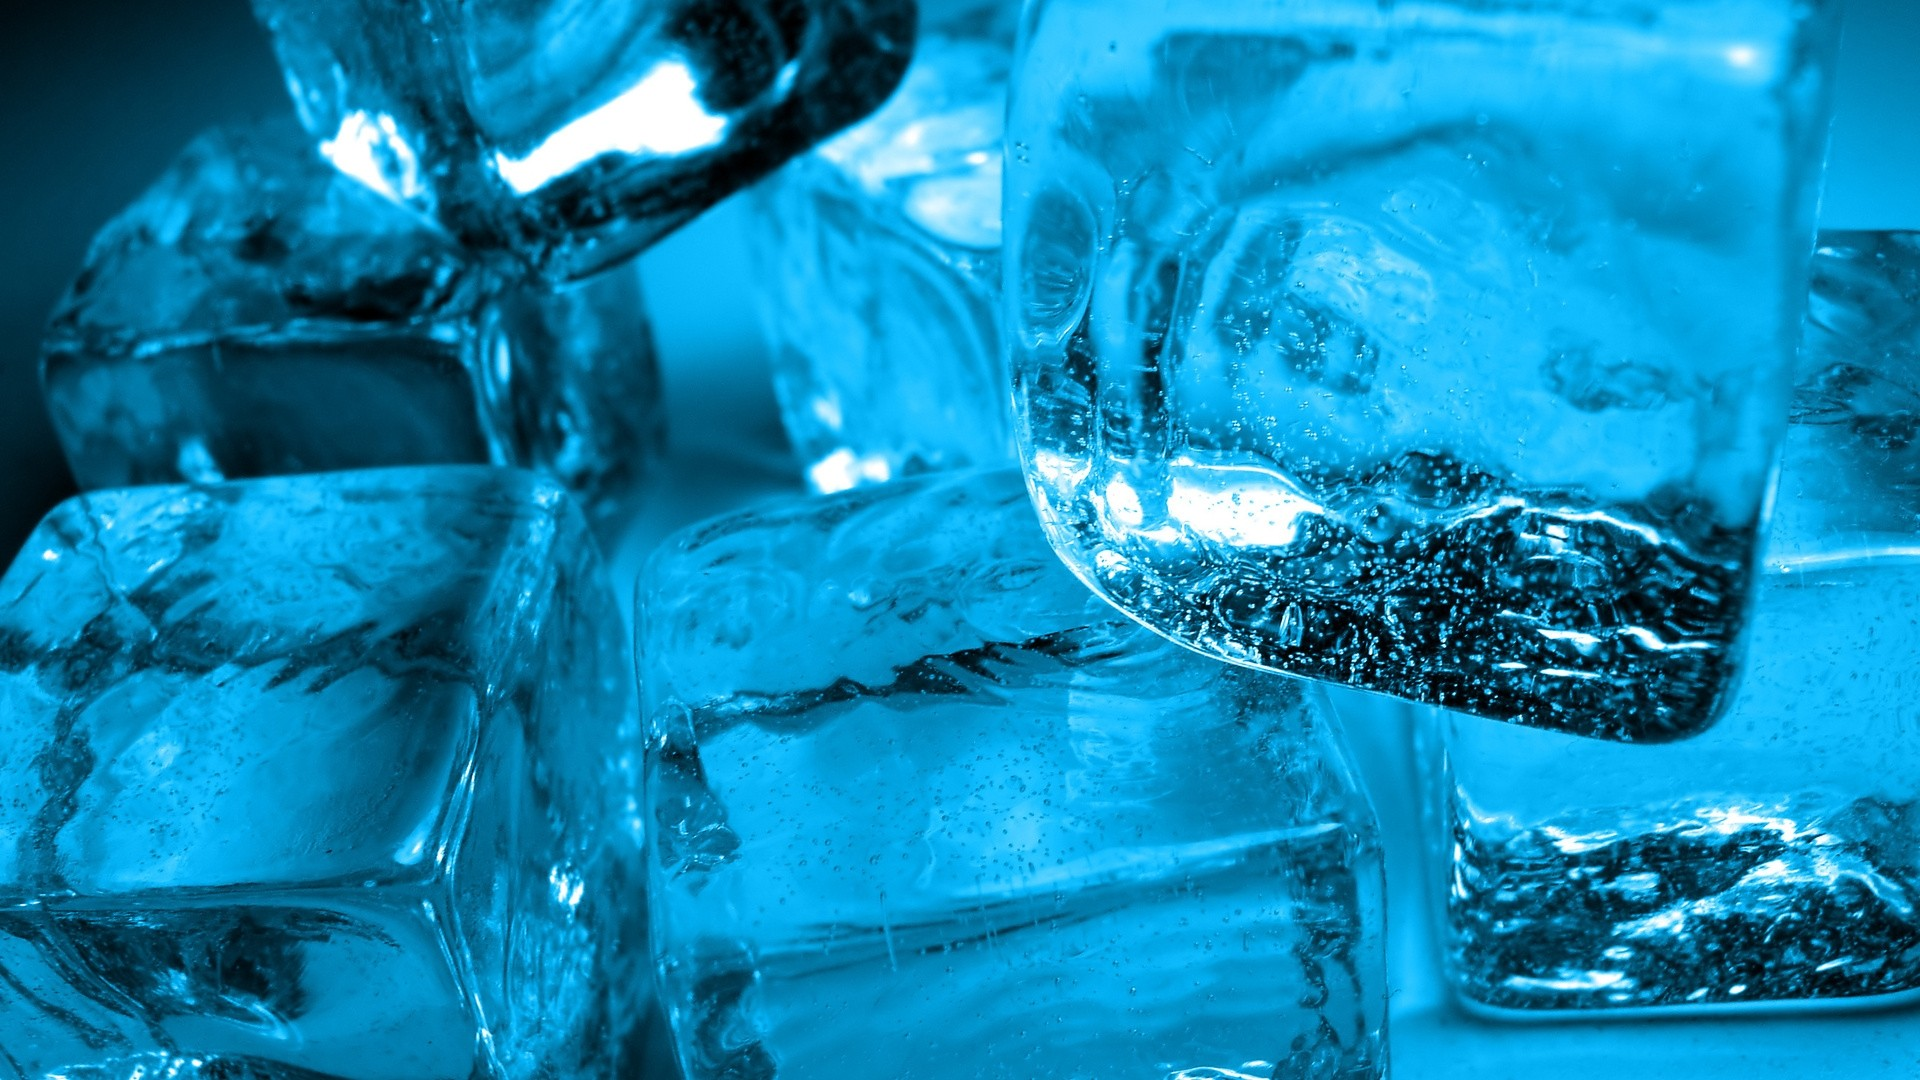 Cold Wallpaper Picture hd